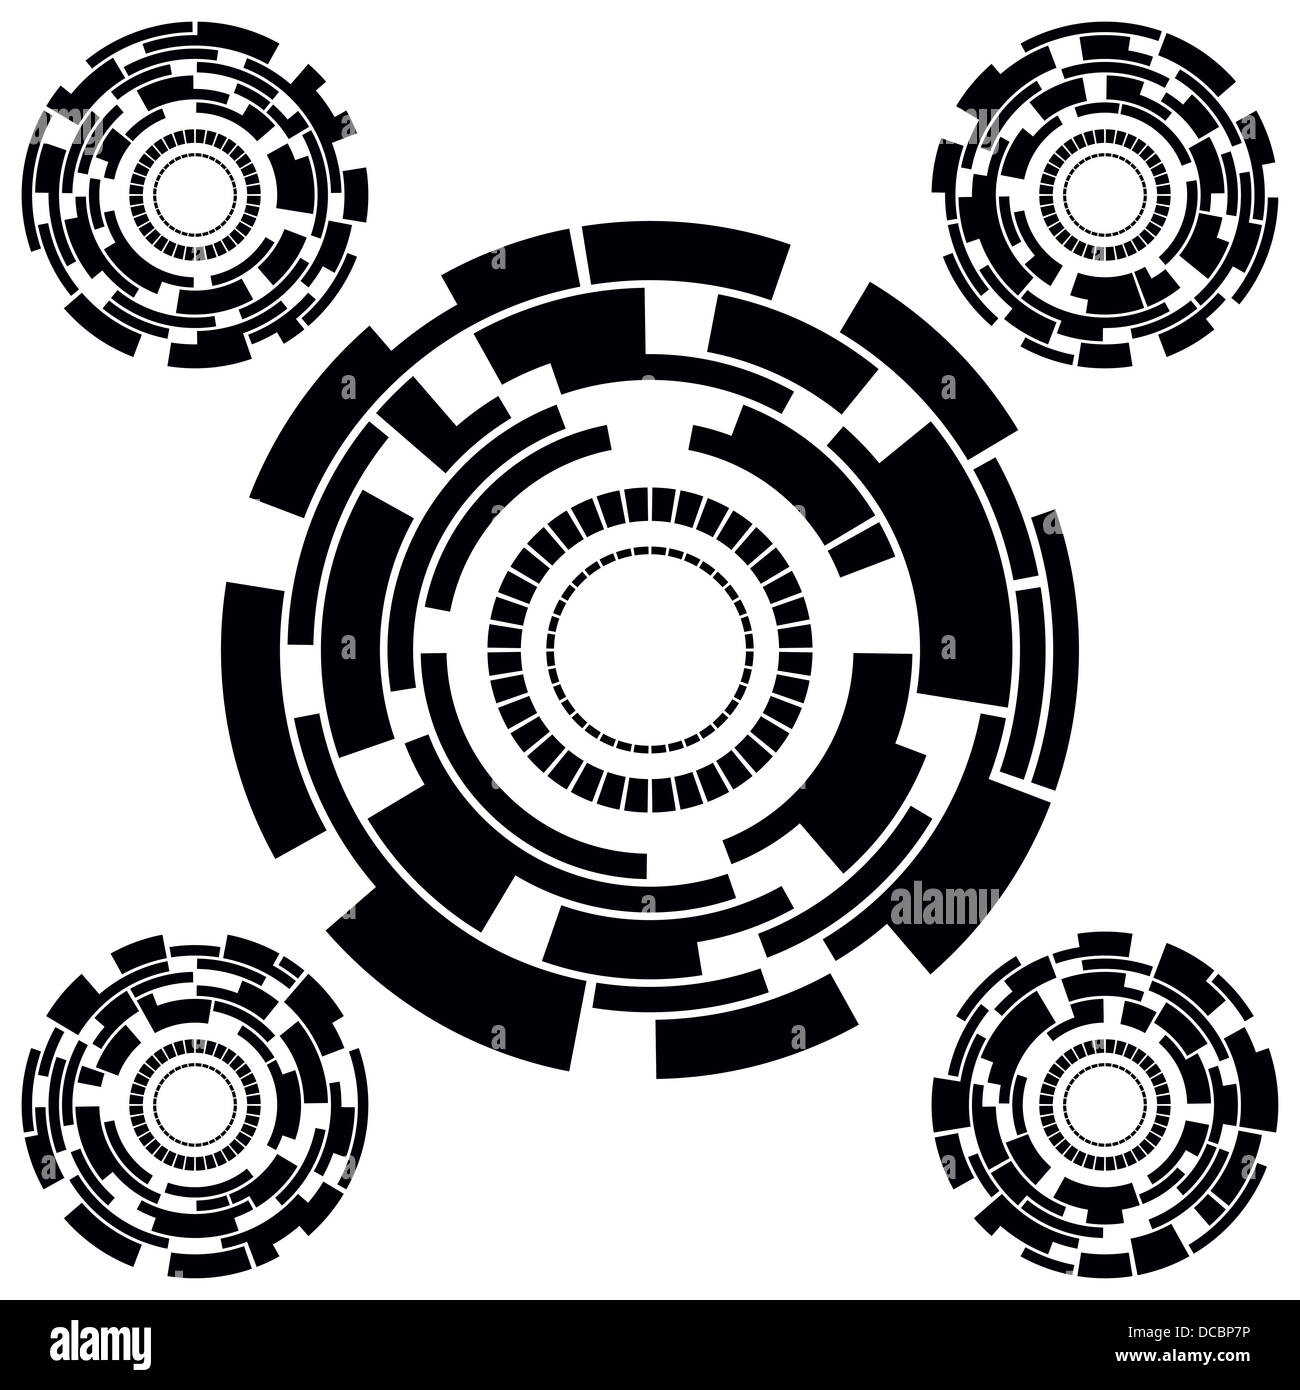 Futuristic Circle Charts - Stock Image